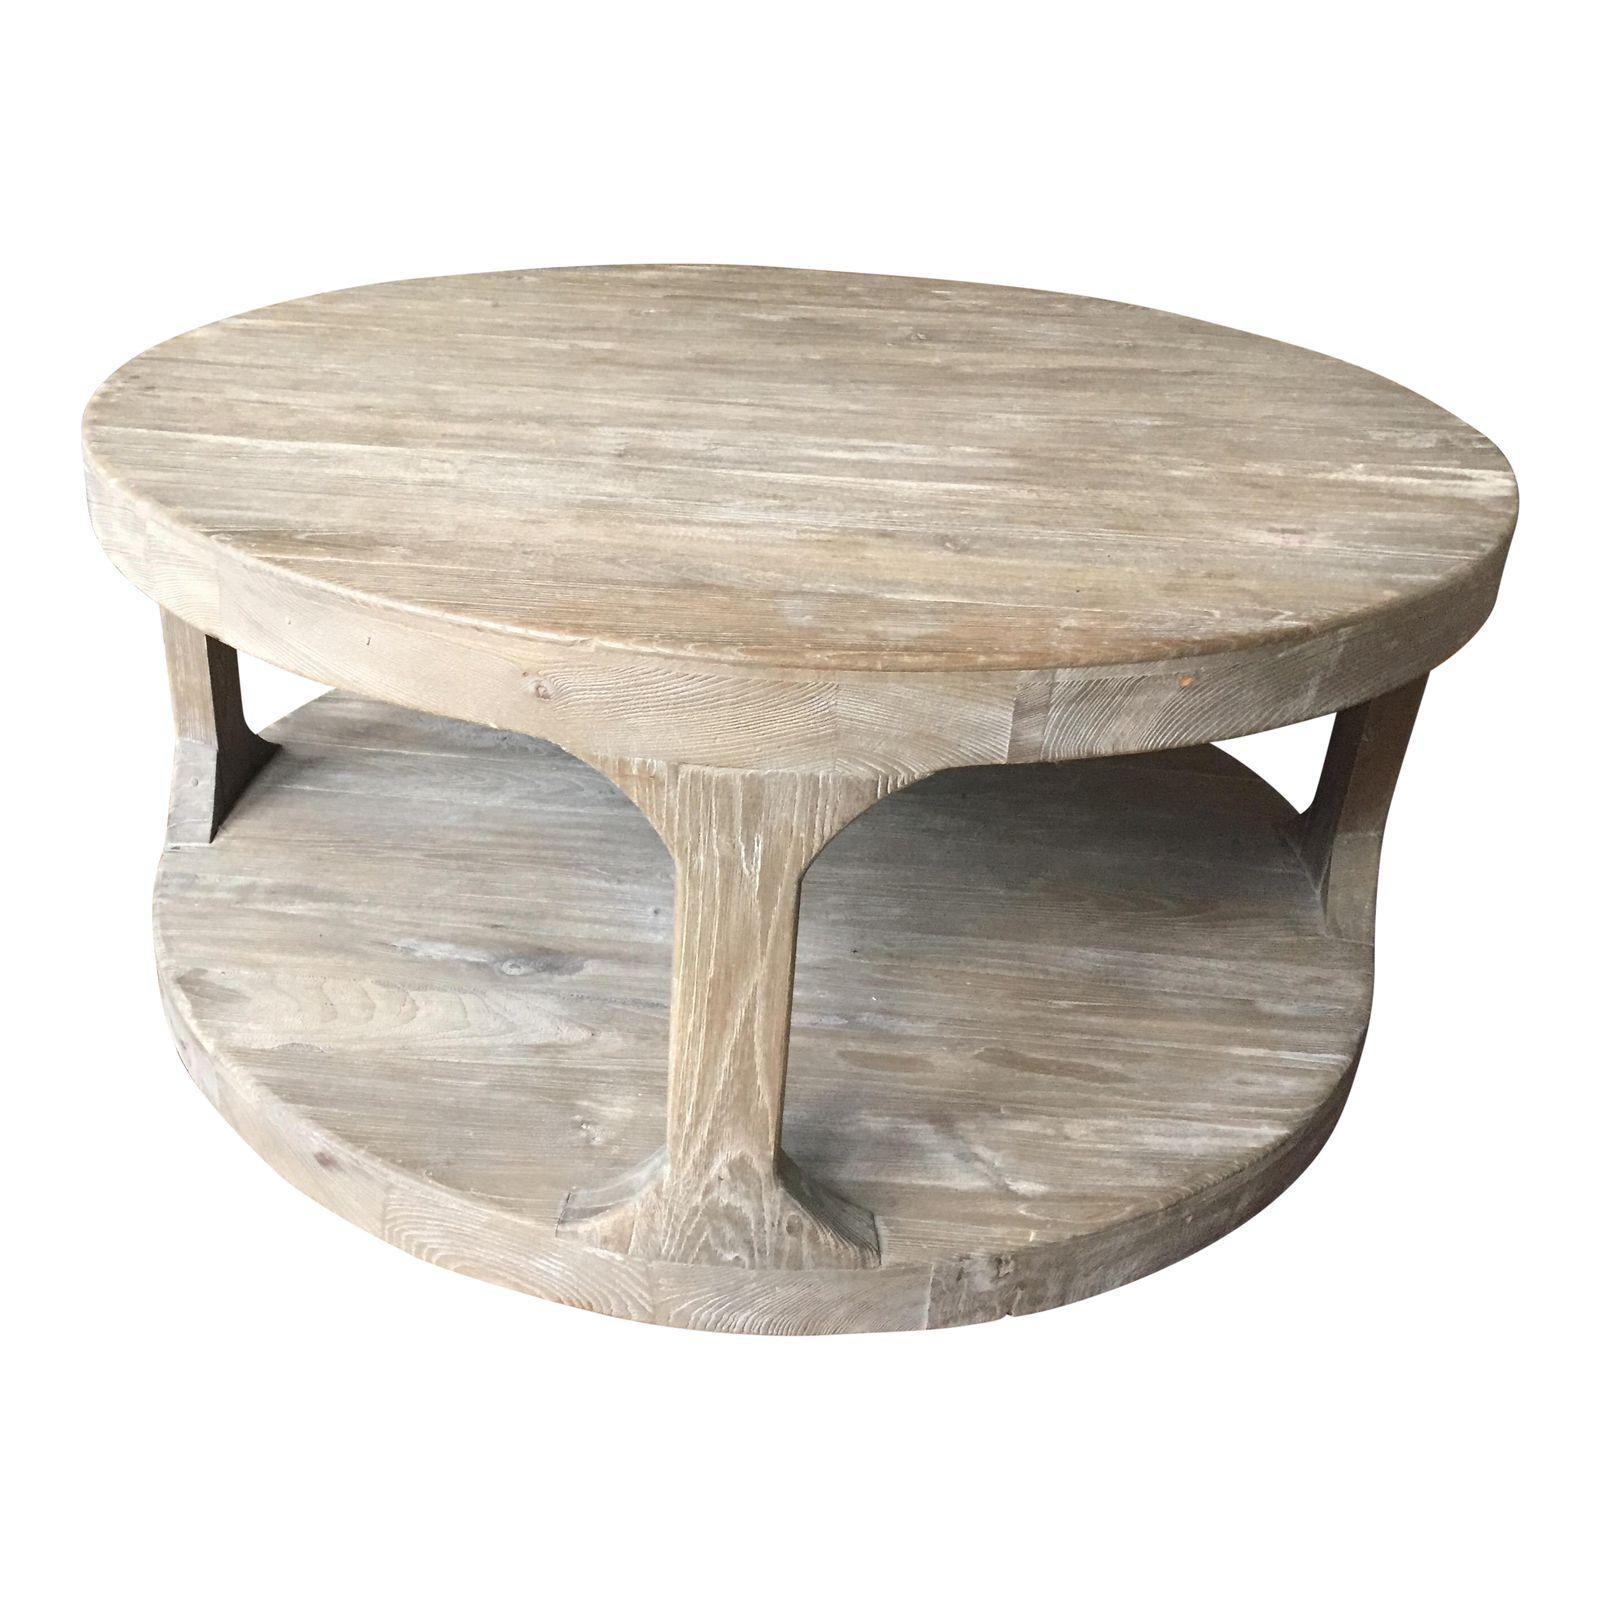 Image Of Restoration Hardware Martens Round Coffee Table Restoration Hardware Table Coffee Table Table [ 1600 x 1600 Pixel ]